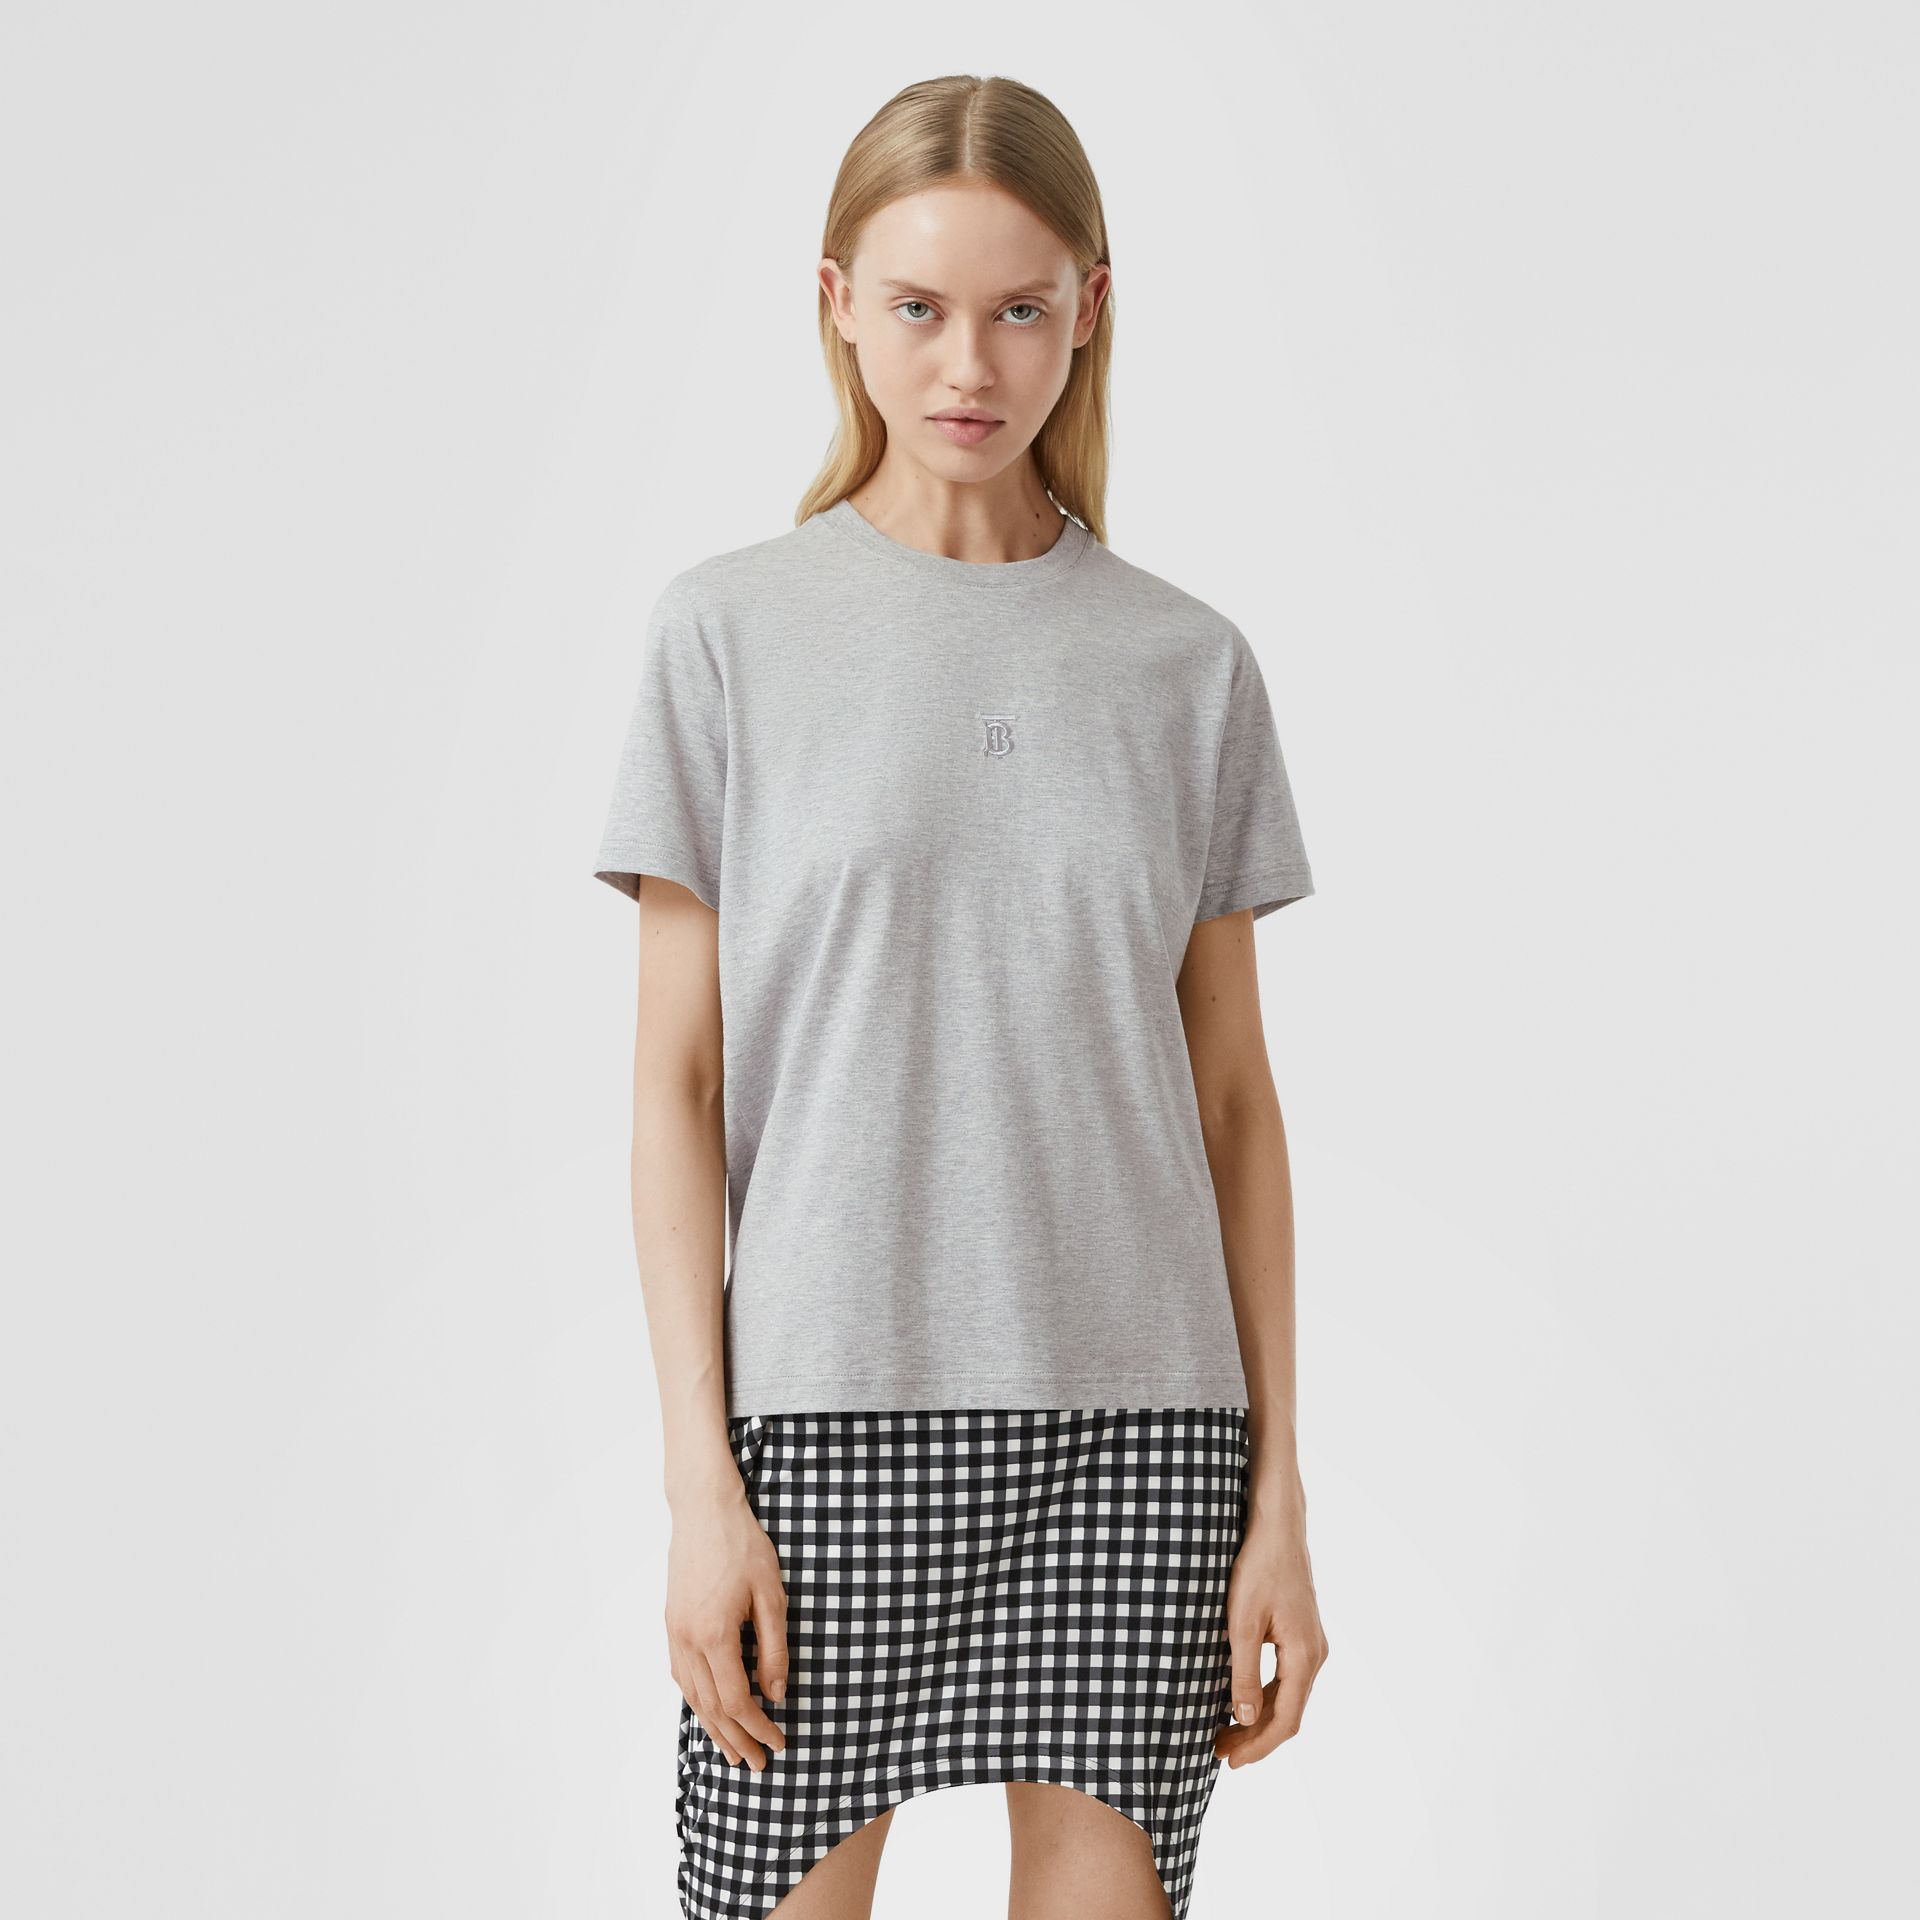 Monogram Motif Cotton T-shirt in Pale Grey Melange - Women | Burberry United States - gallery image 4